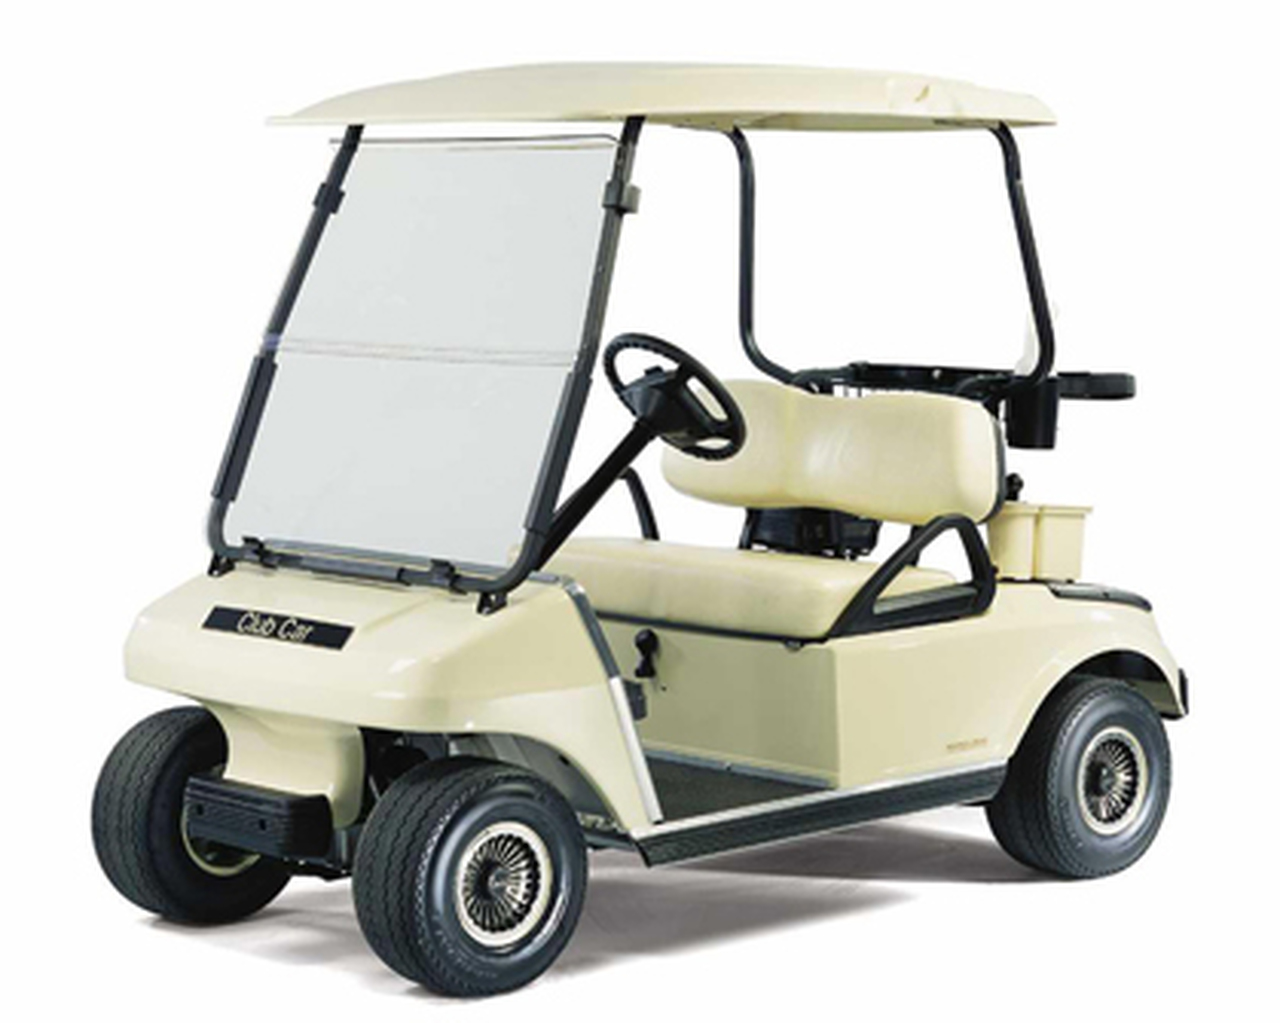 Picture of: Golf Cart Rear Seat Kit Ezgo Club Car Yamaha Golf Carts